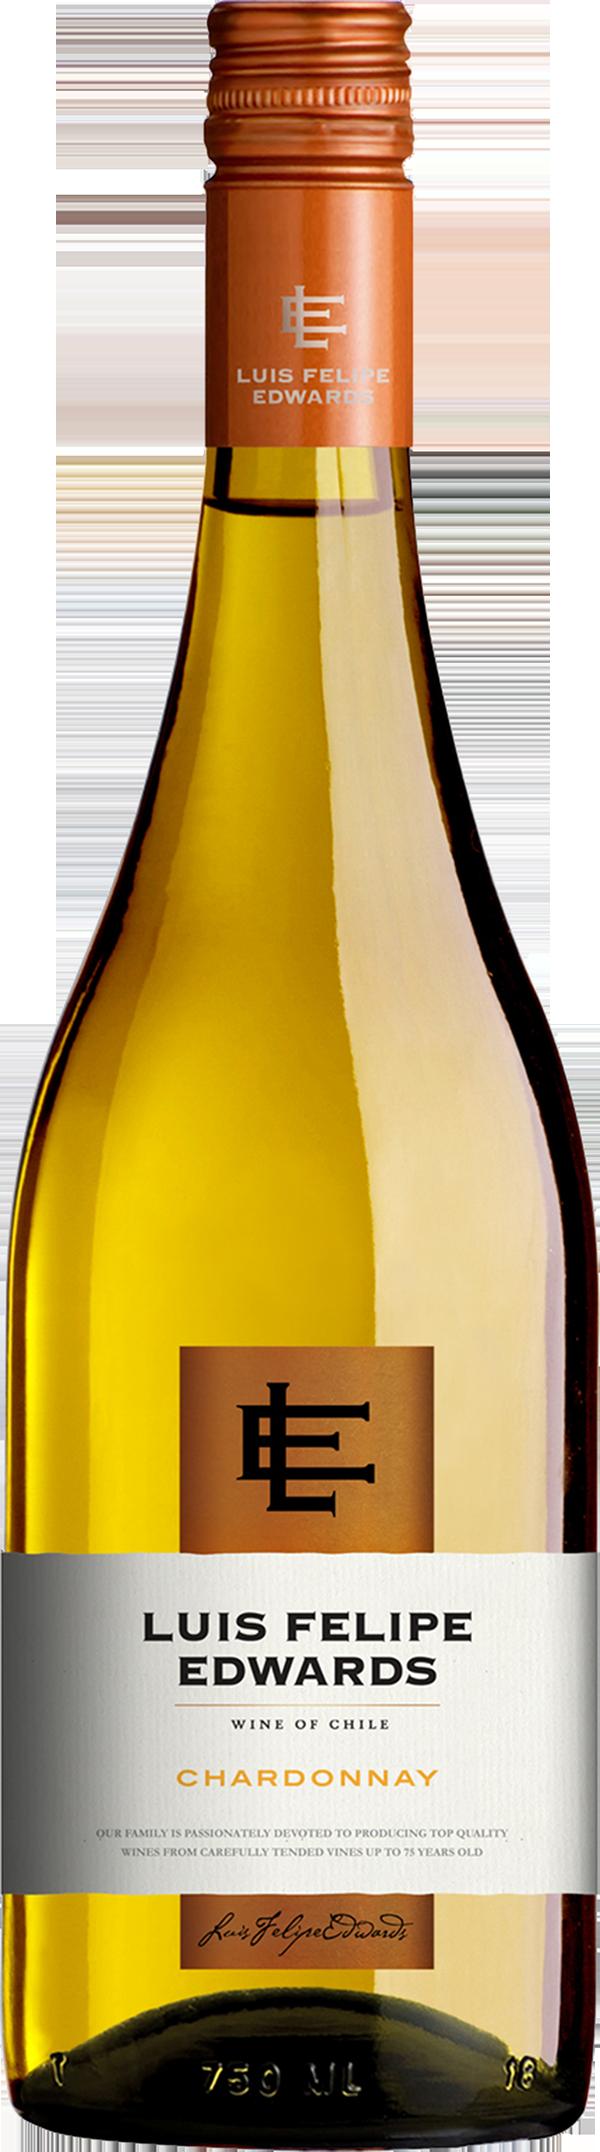 Luis Felipe Edwards Chardonnay Pupilla